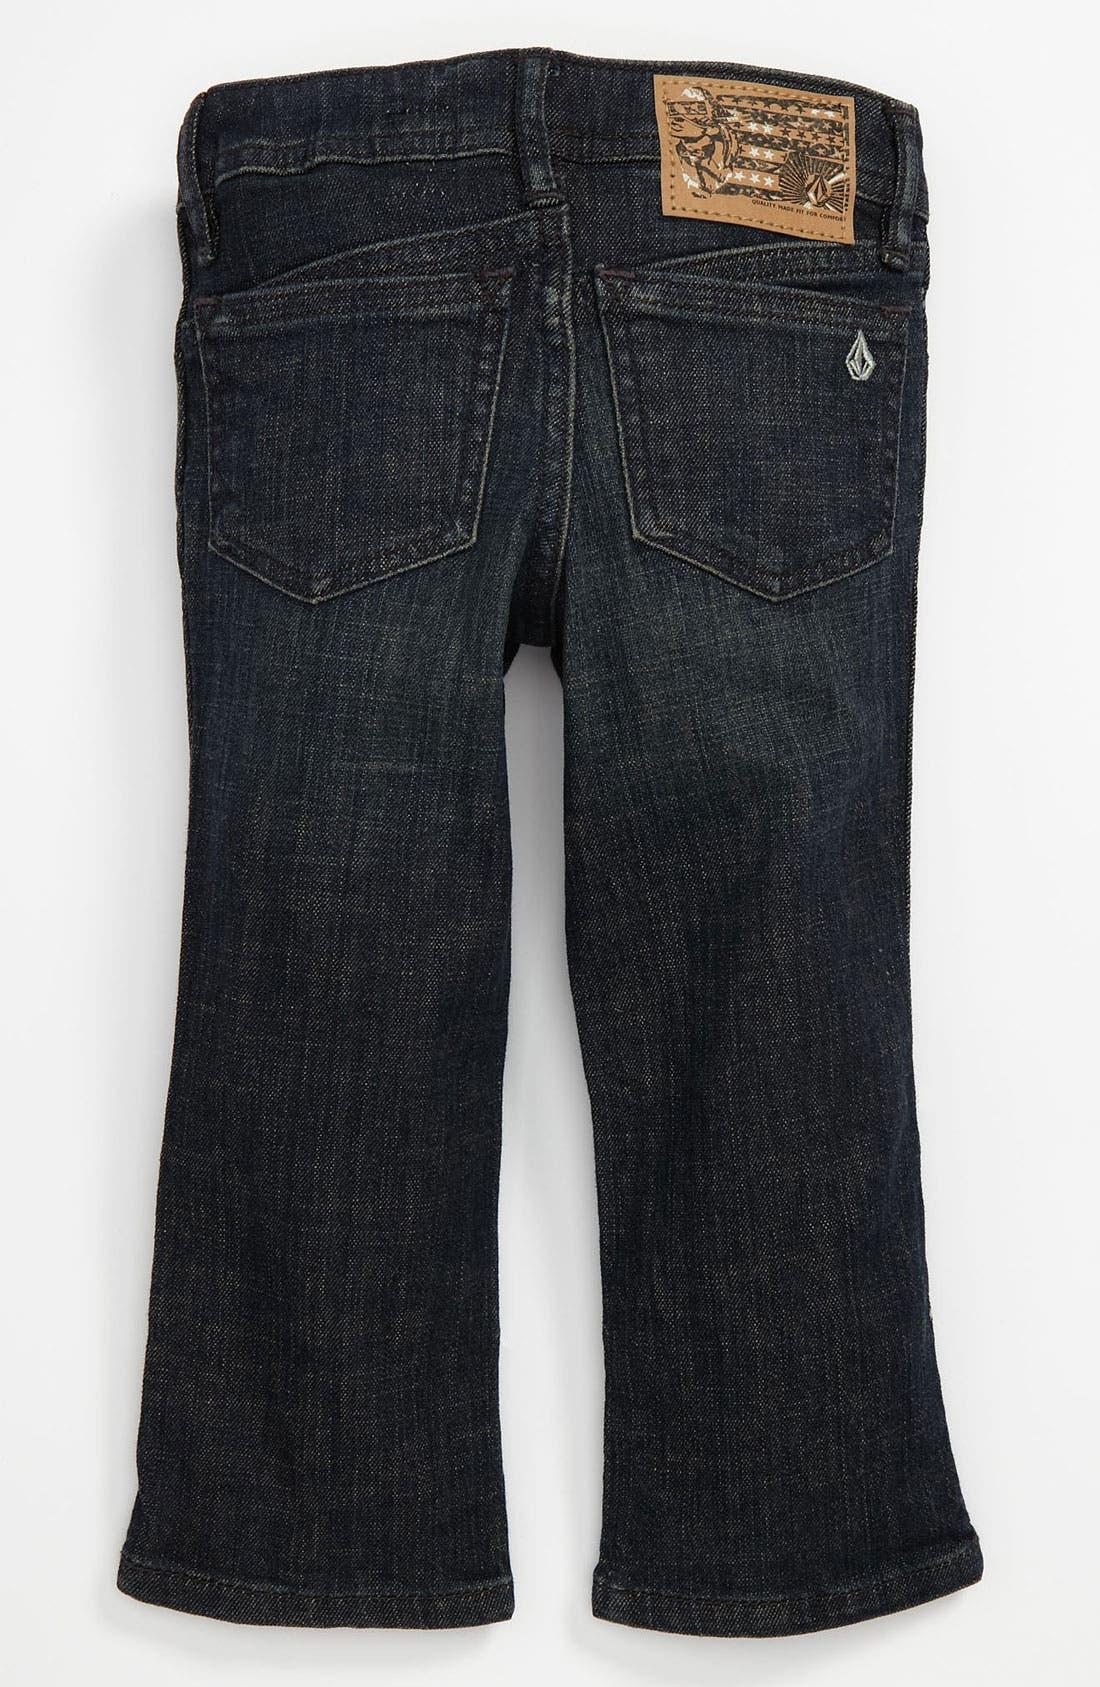 Main Image - Volcom '2x4' Jeans (Toddler)